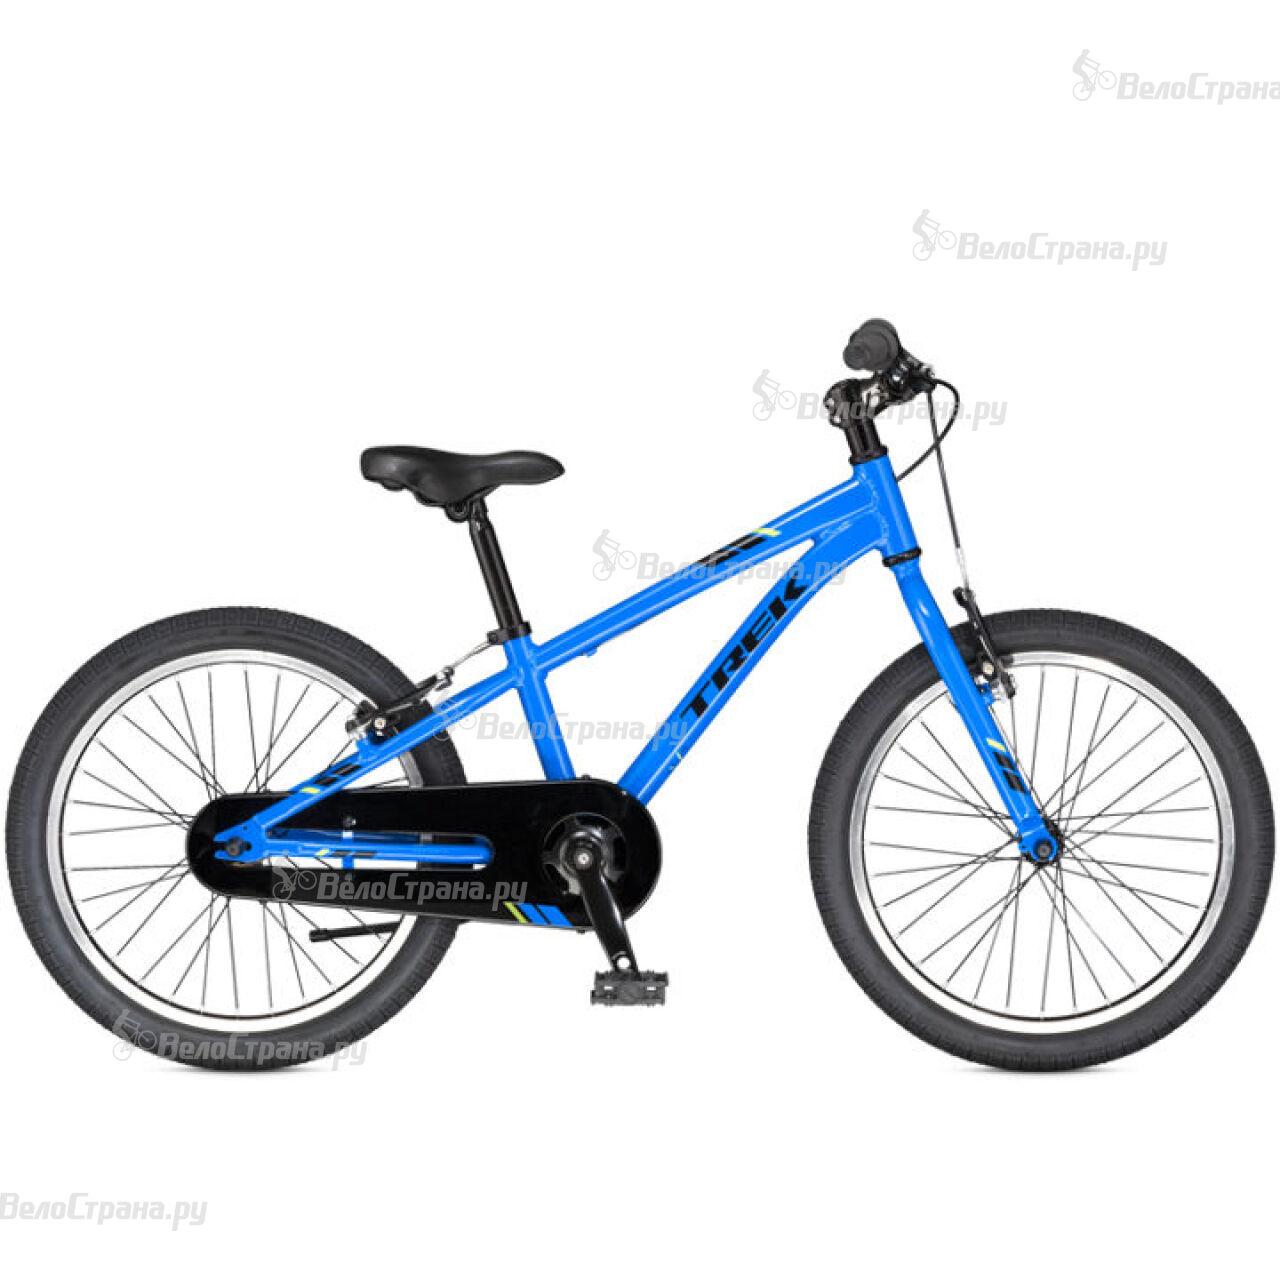 Велосипед Trek Precaliber 20 SS CST Boys (2017)